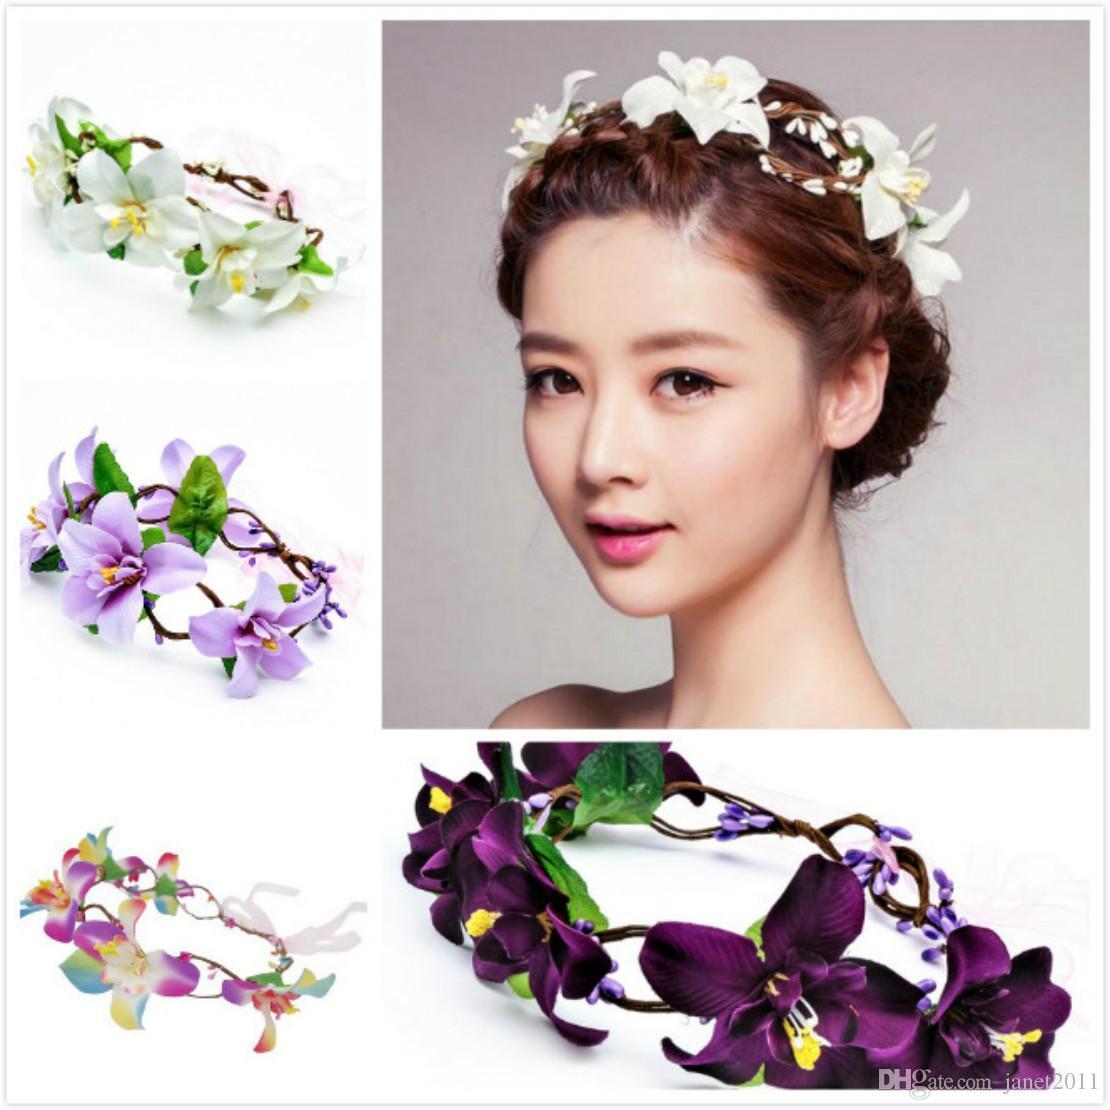 Flower Crown Floral Wreath Headband Floral Garland Headbands Photo Props